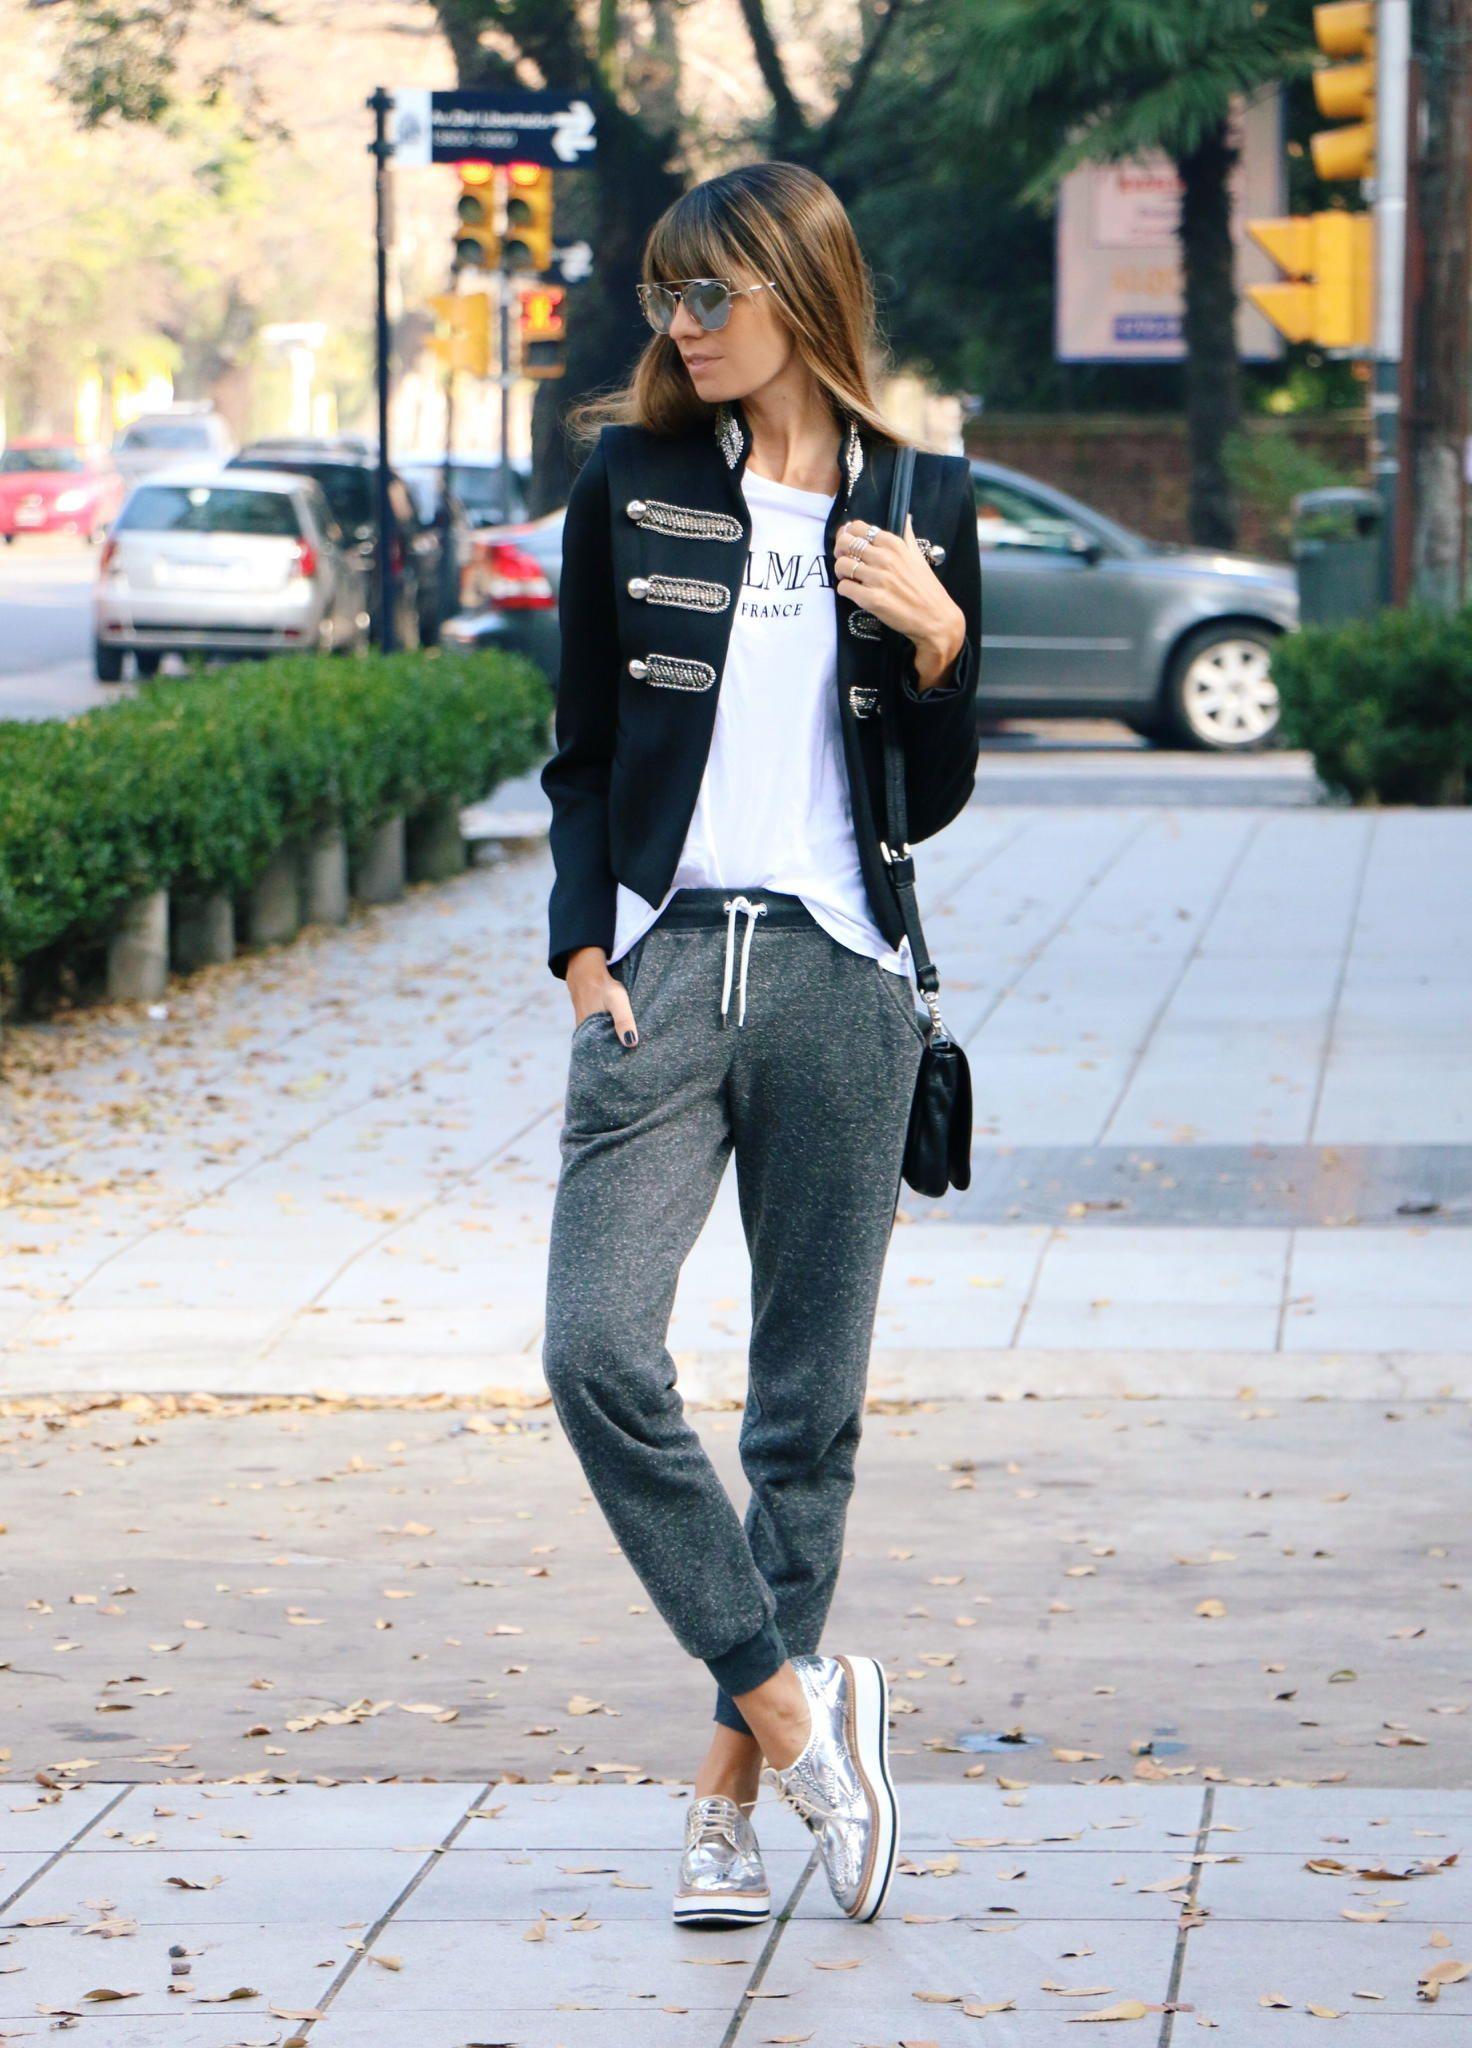 new arrival b8458 e117b Chica usando unos jogger pants de color gris con una chaqueta de color negro